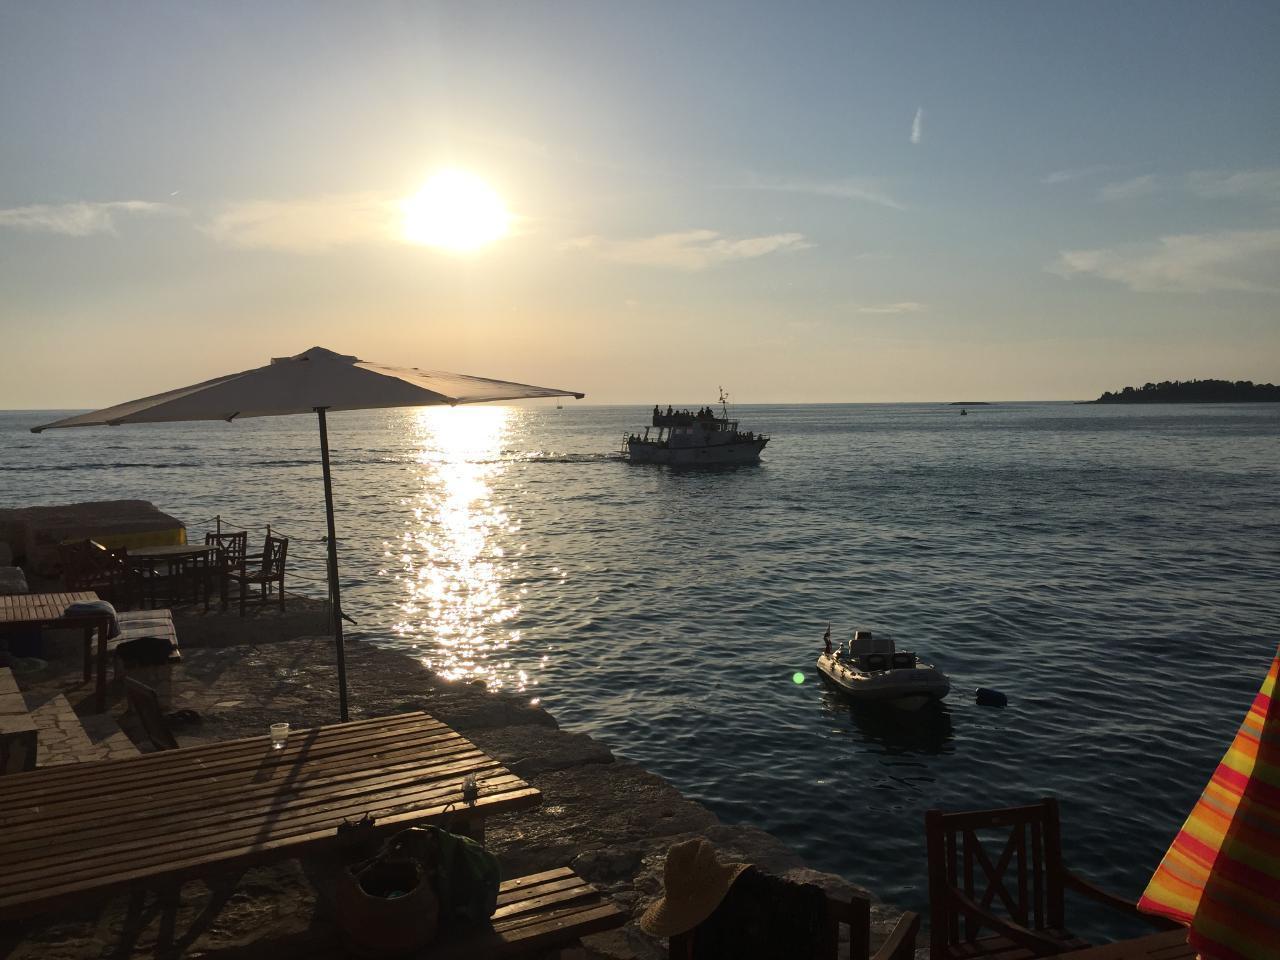 Ferienwohnung FEWO-9 in ROVINJ direkt am Meer (96169), Rovinj, , Istrien, Kroatien, Bild 22